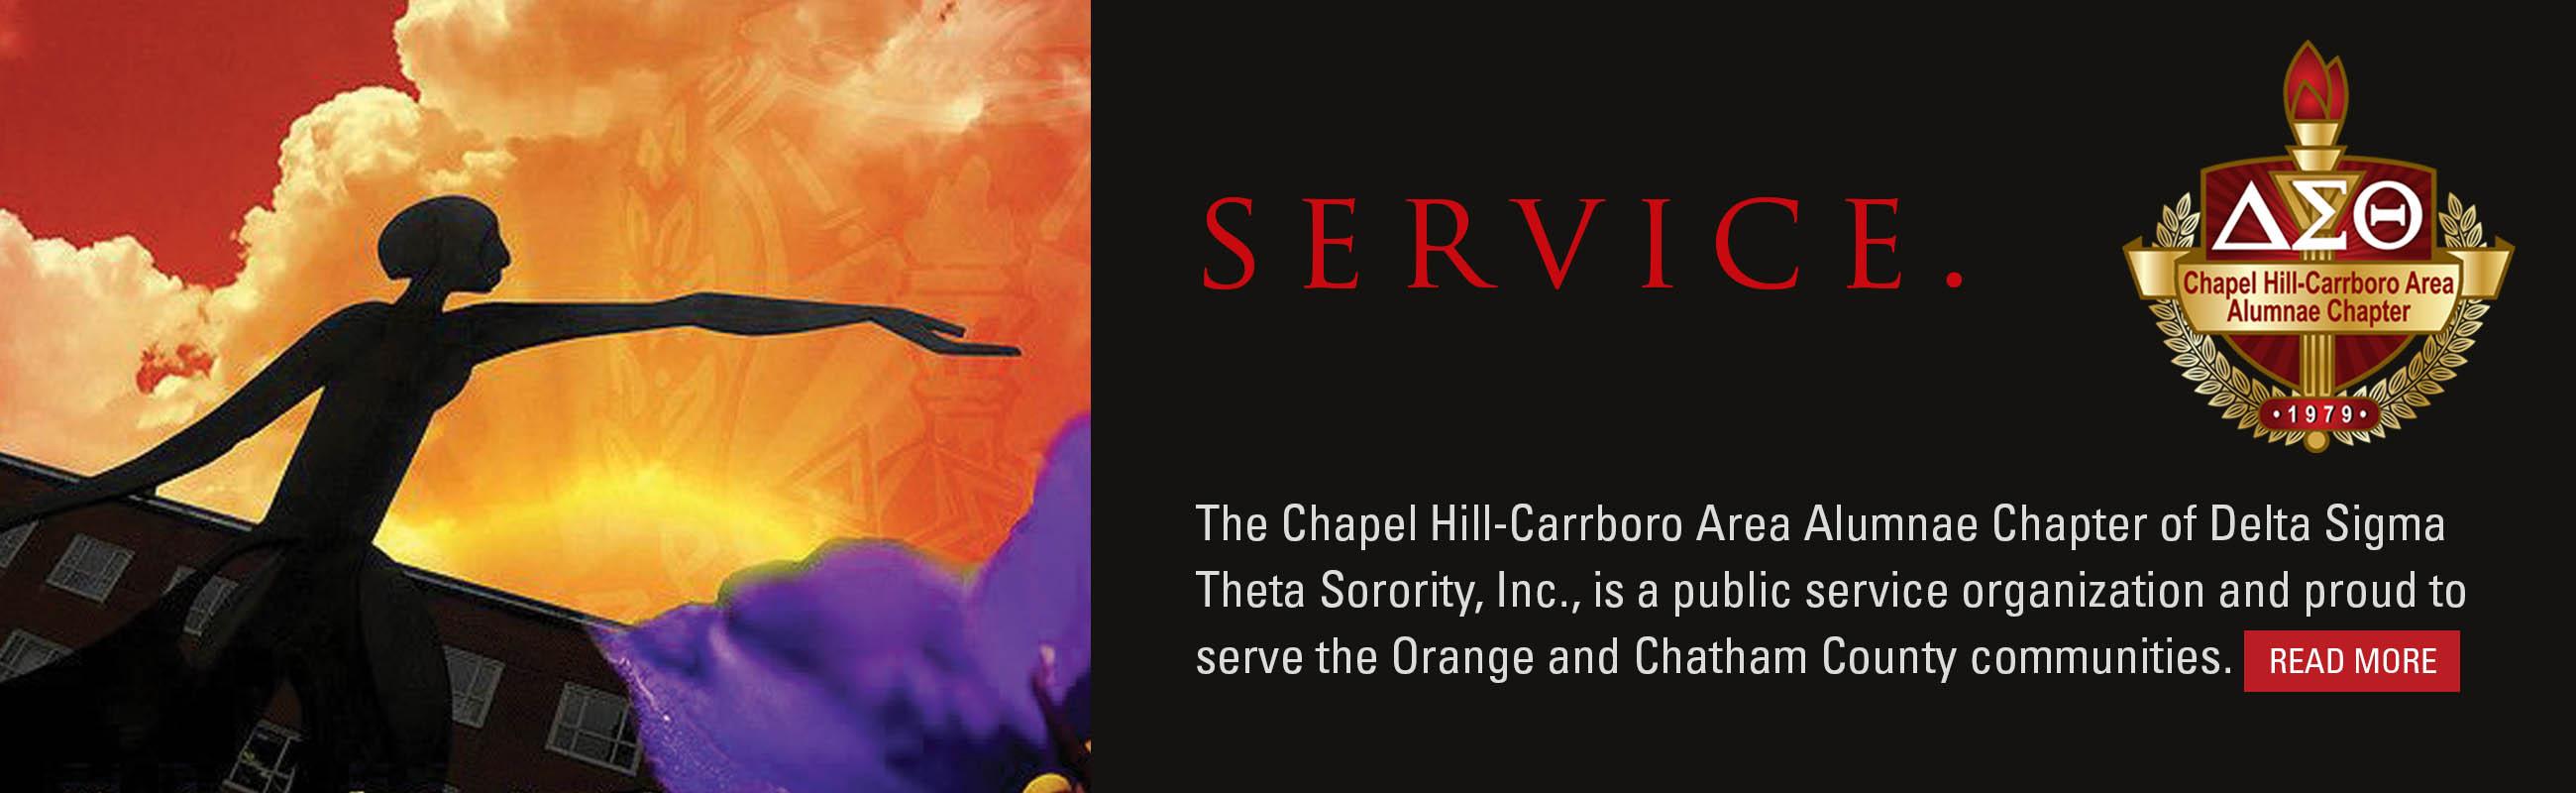 CHCAA_Service